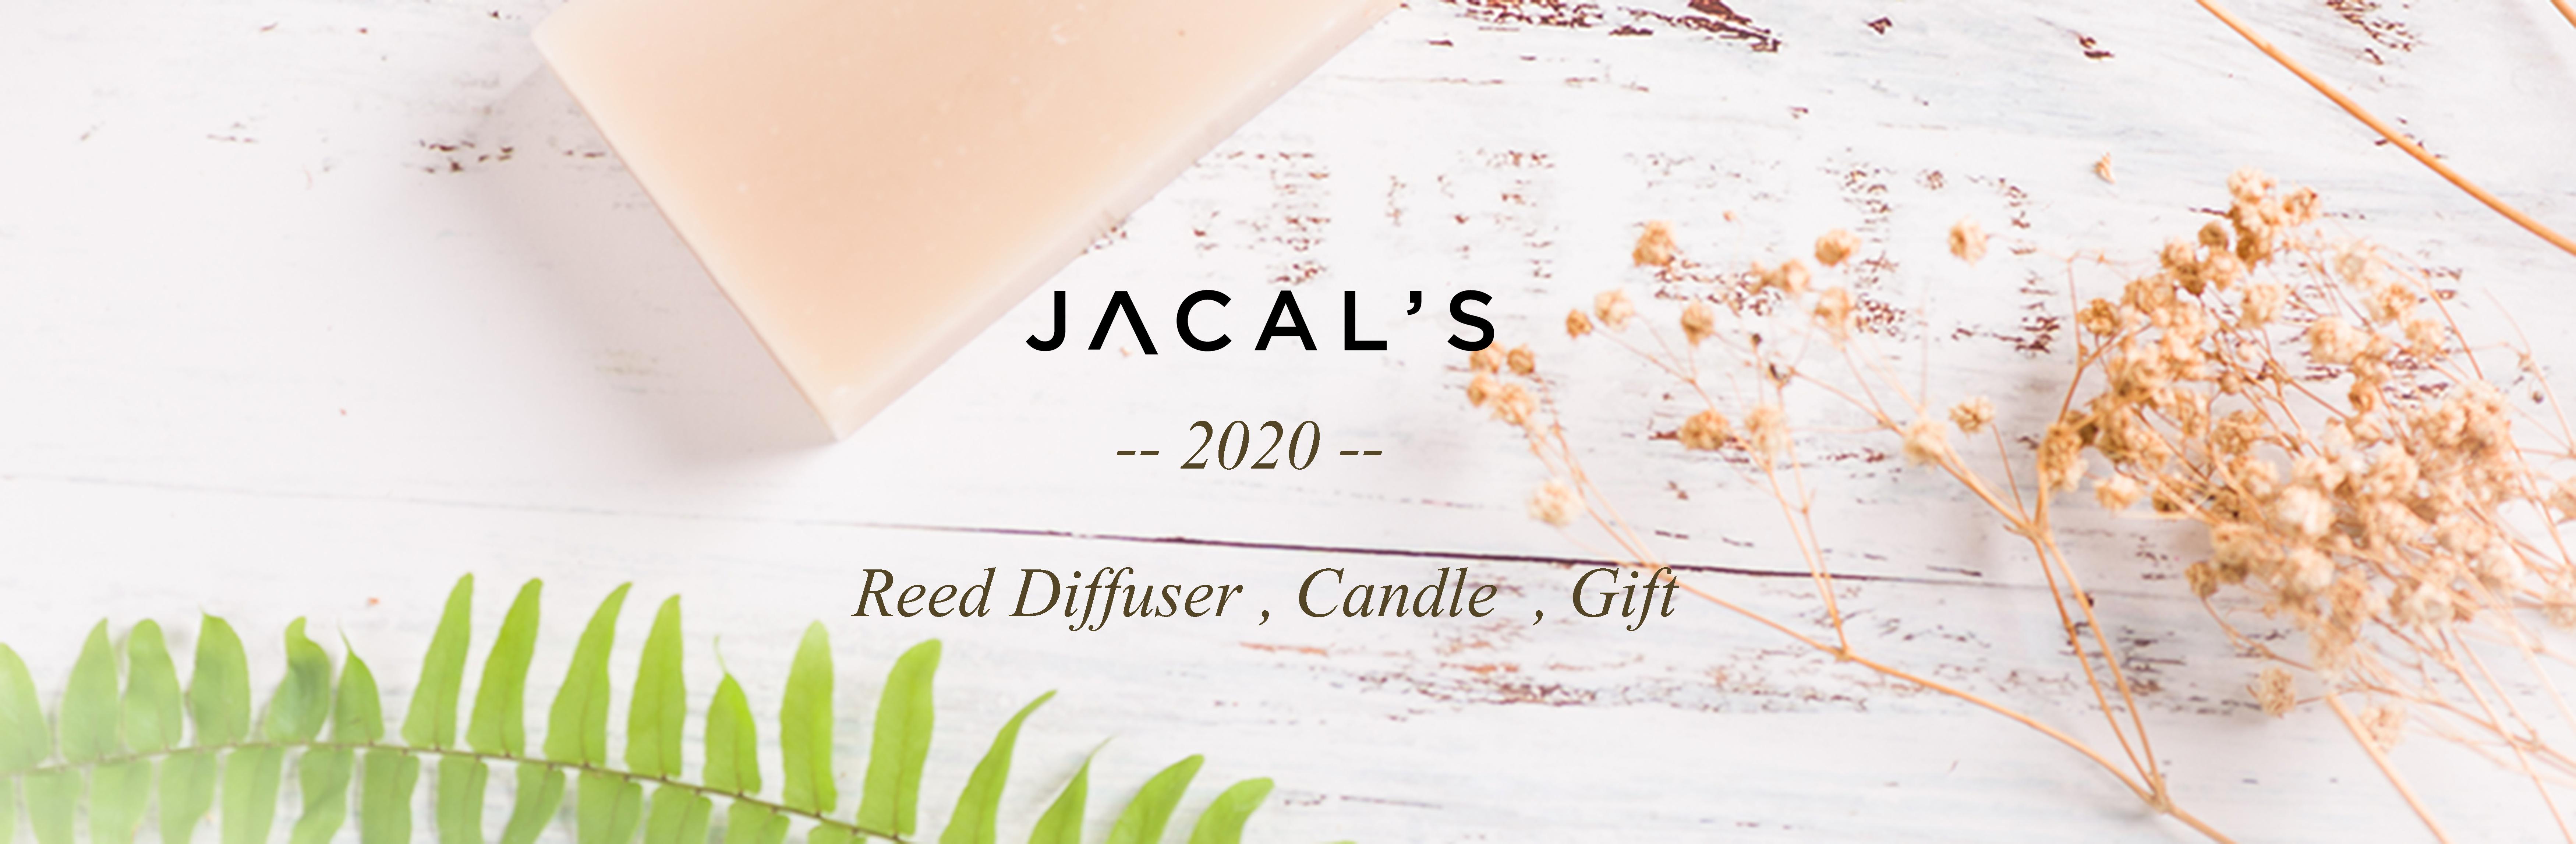 Jacals官網首圖